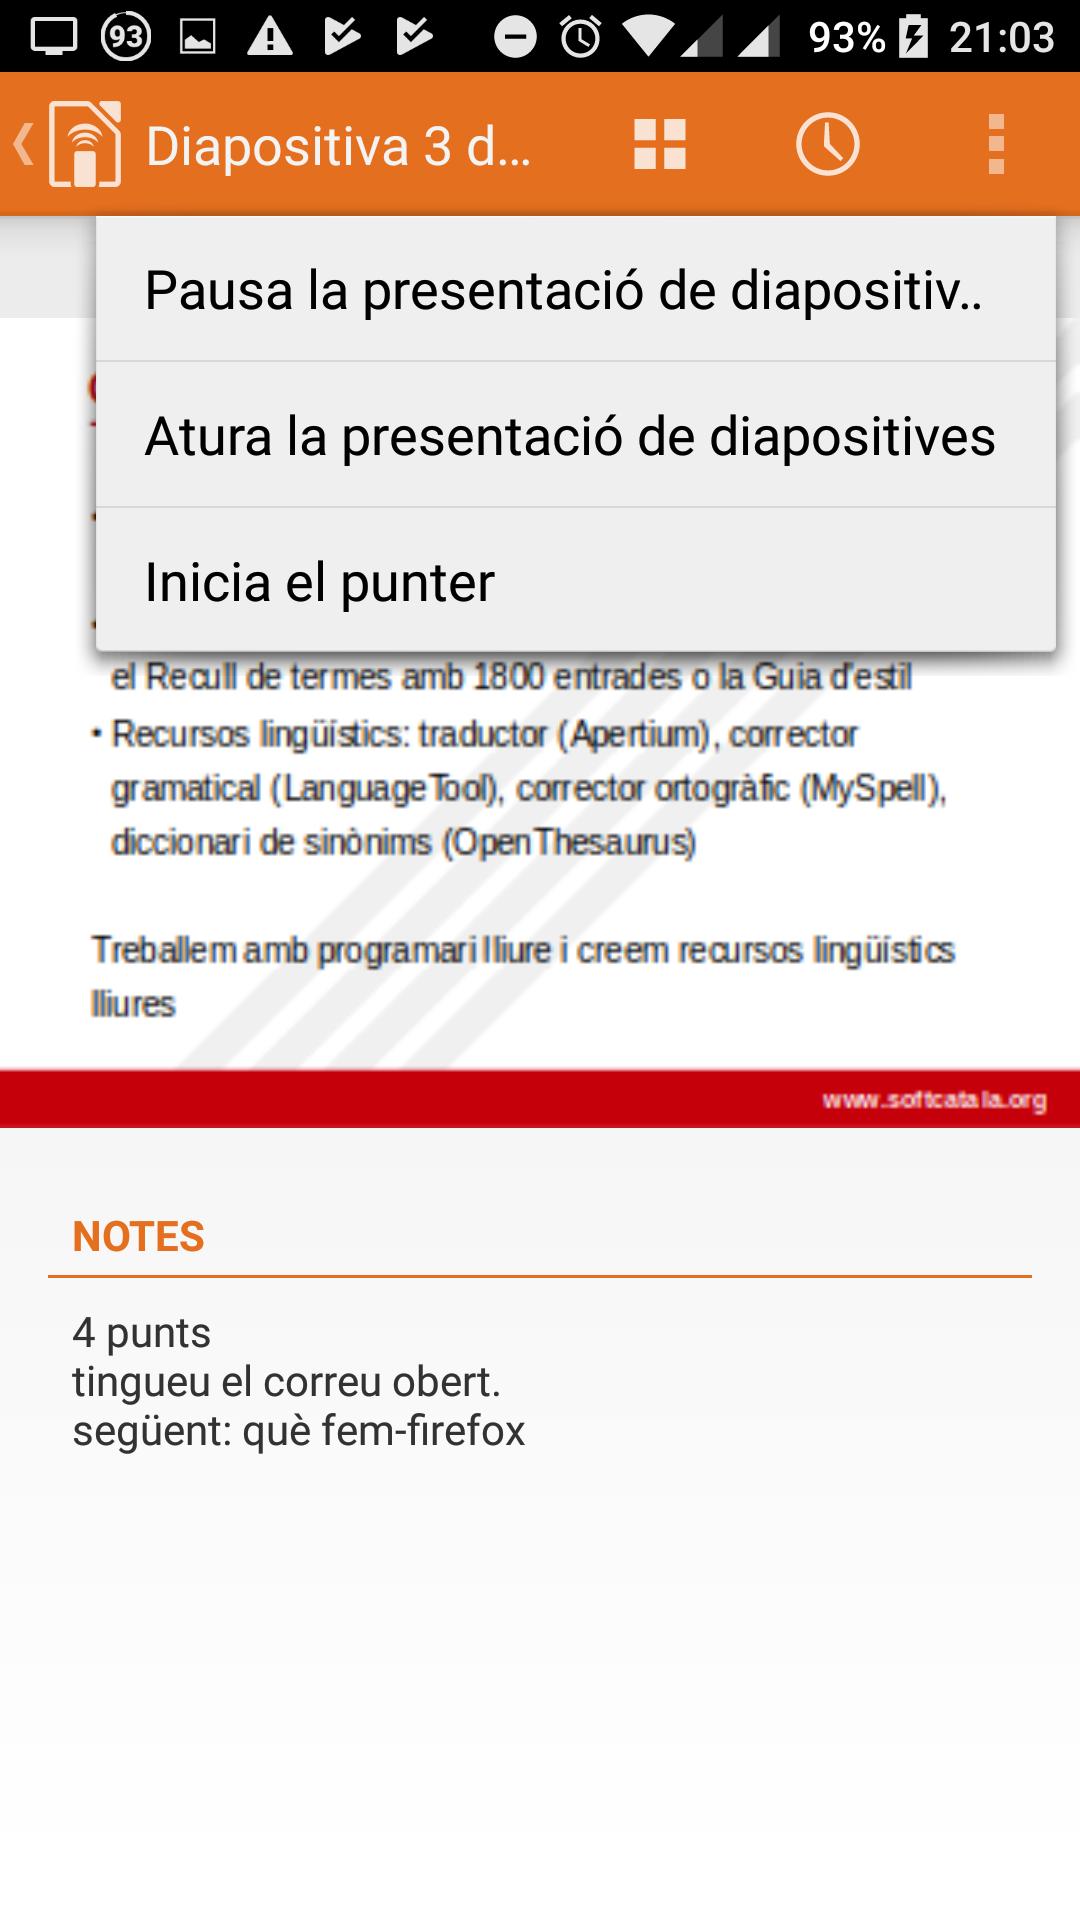 Imatge destacada 1 del LibreOffice Impress Remote